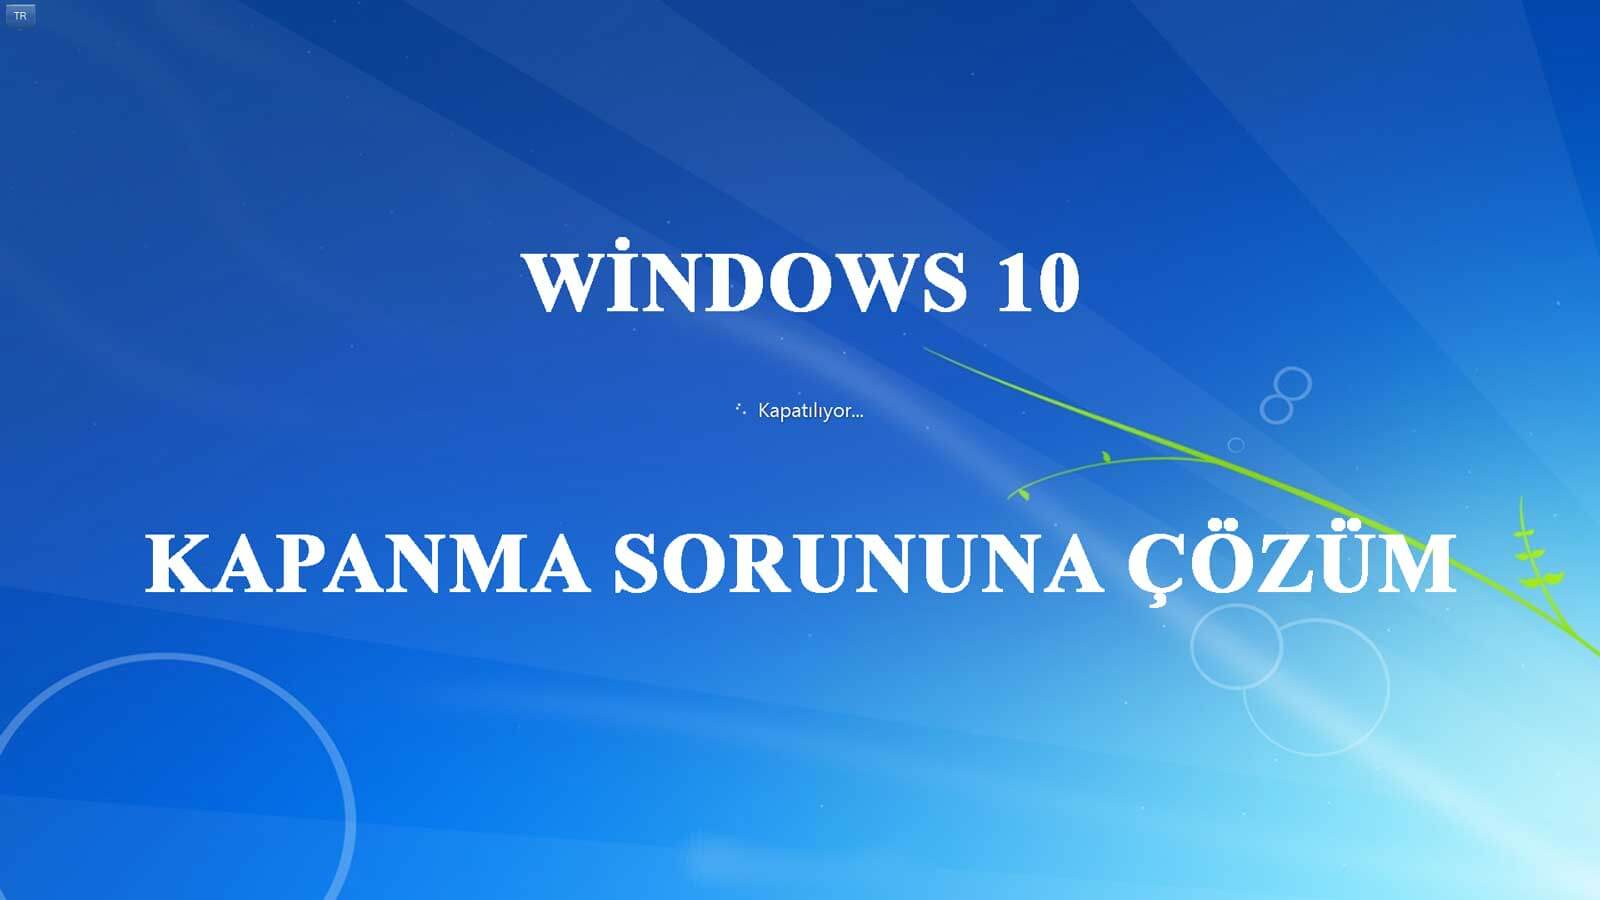 Windows 10 Kapanıyor Windows 10 Yavaş Kapanma Windows 10 Yavaş Kapanma Soru İçin Çözüm windows 10 kapaniyor